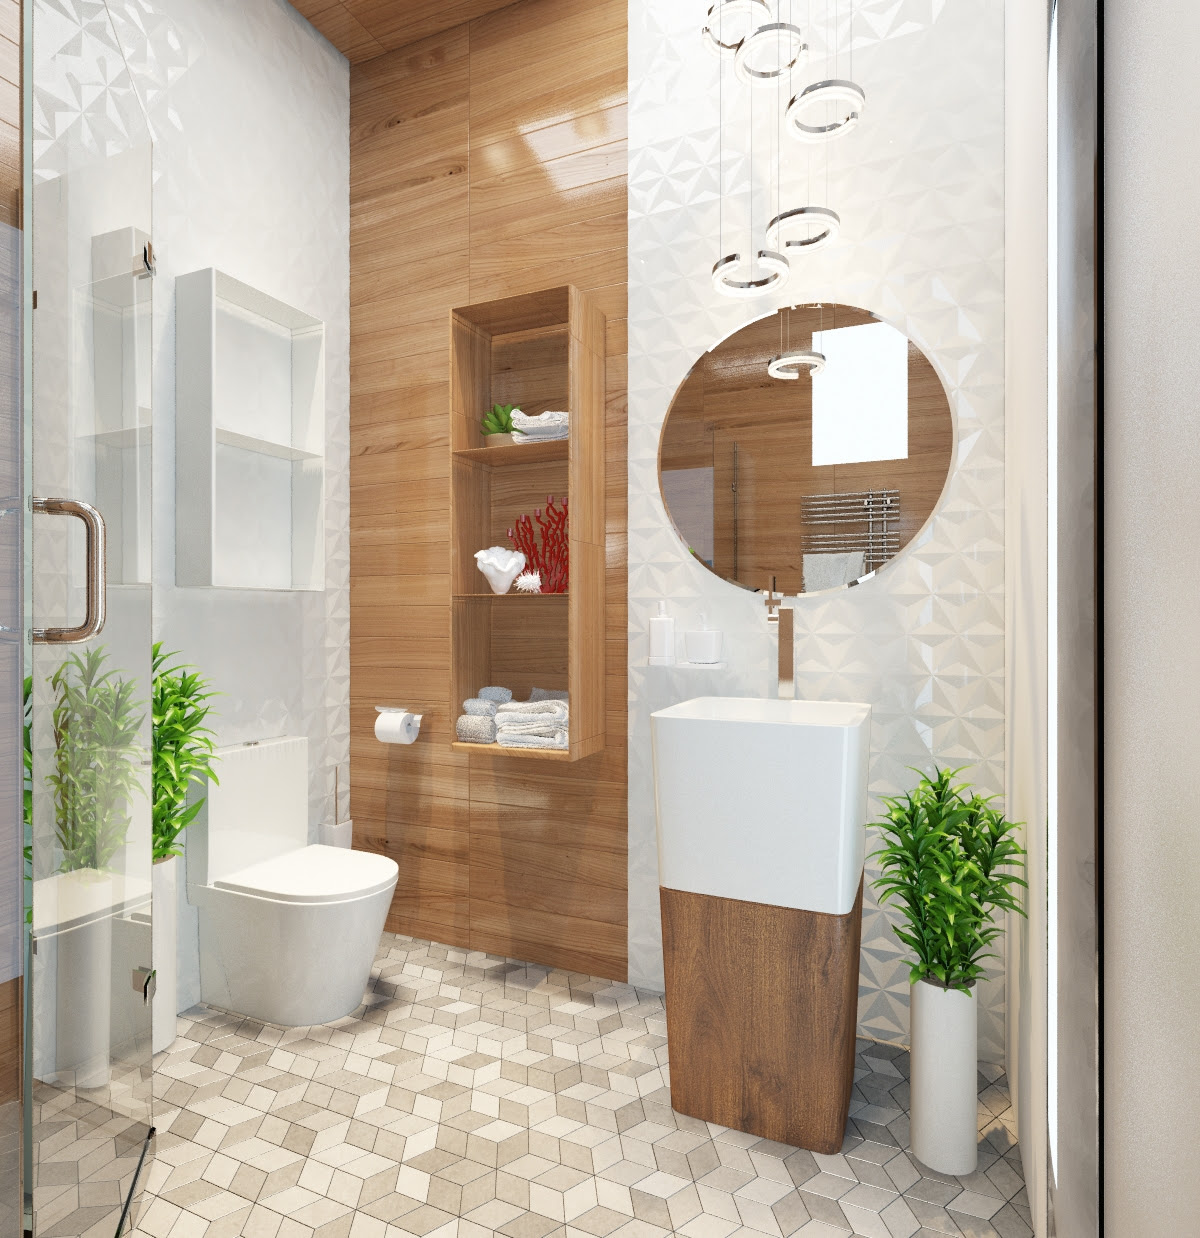 Applying Modern Bathroom Decor With Creative and Perfect ...